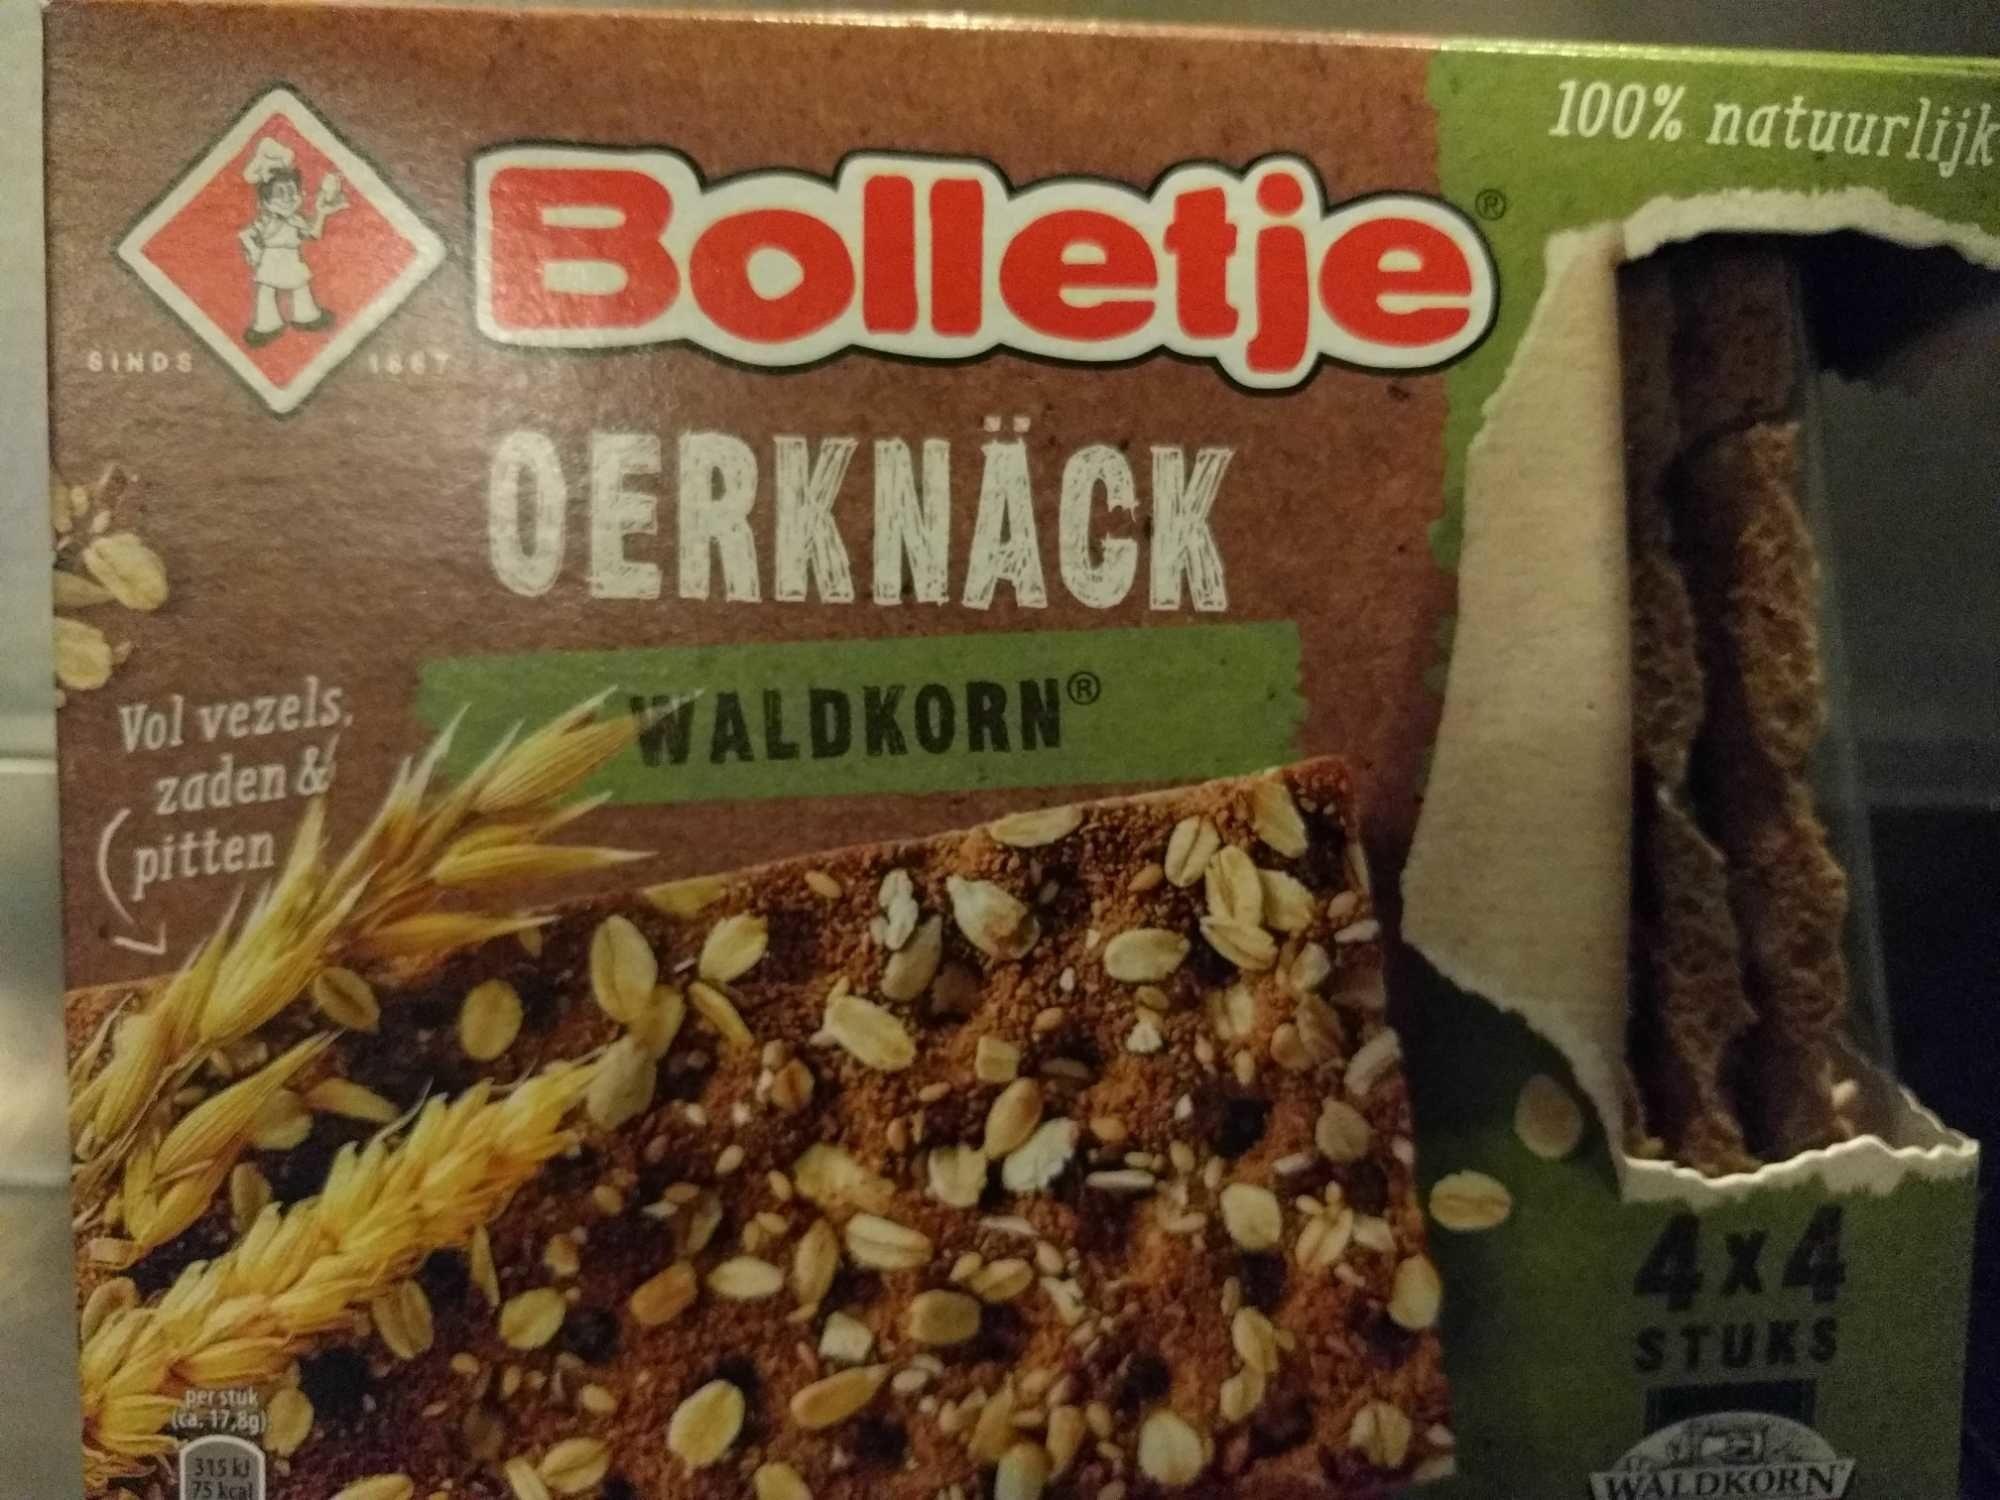 Oerknäck waldkorn - Product - nl